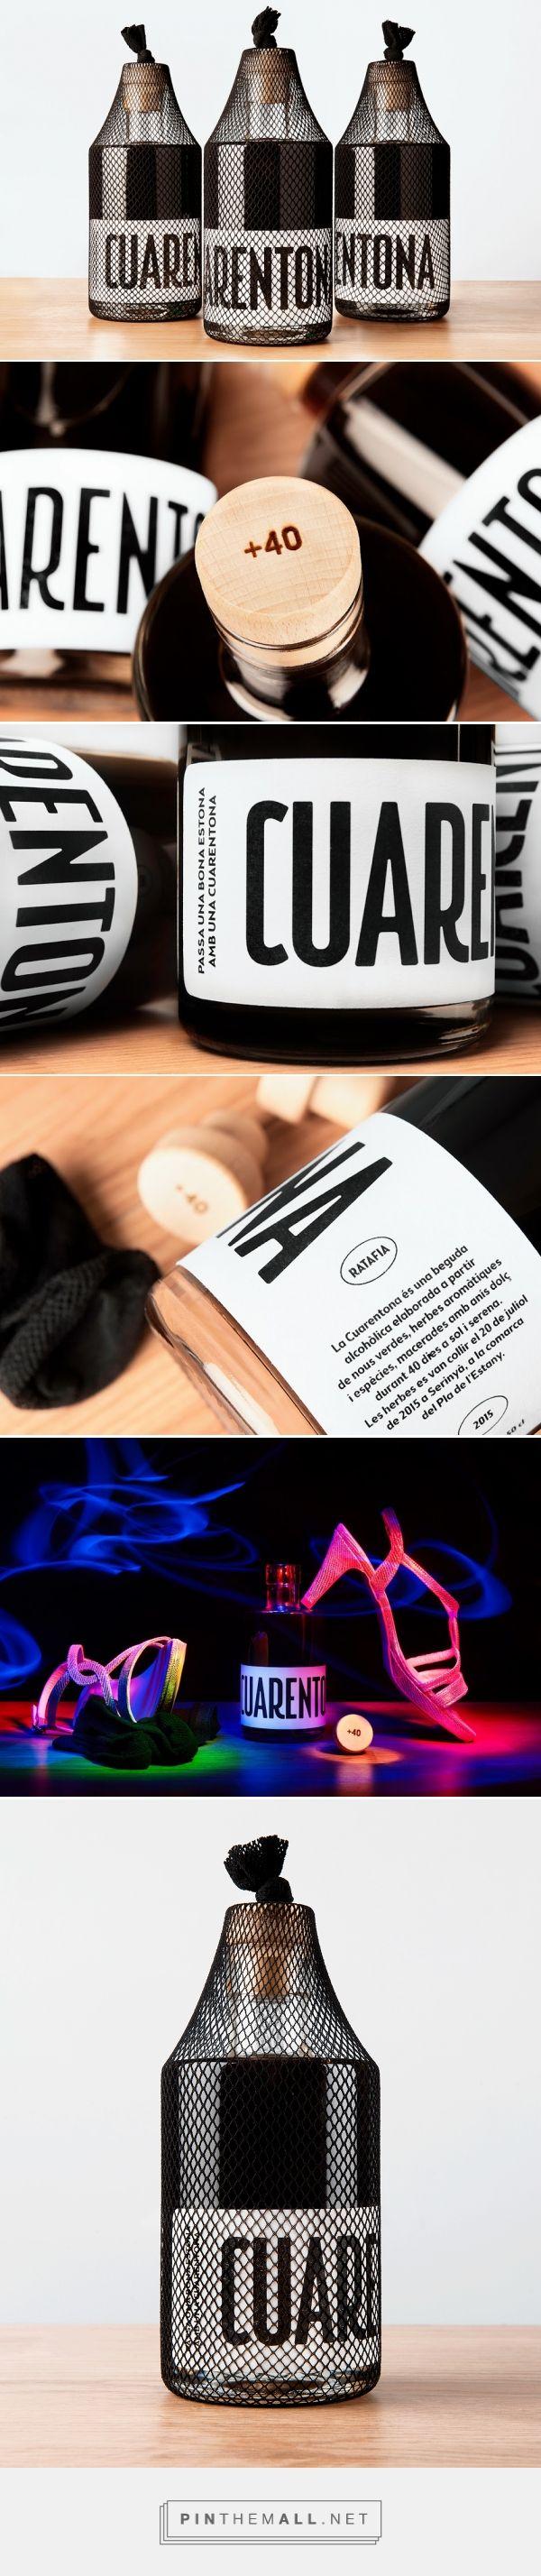 Cuarentona (Fortyish) alcoholic beverage packaging designed by Enserio (Spain) - http://www.packagingoftheworld.com/2016/04/cuarentona-fortyish.html